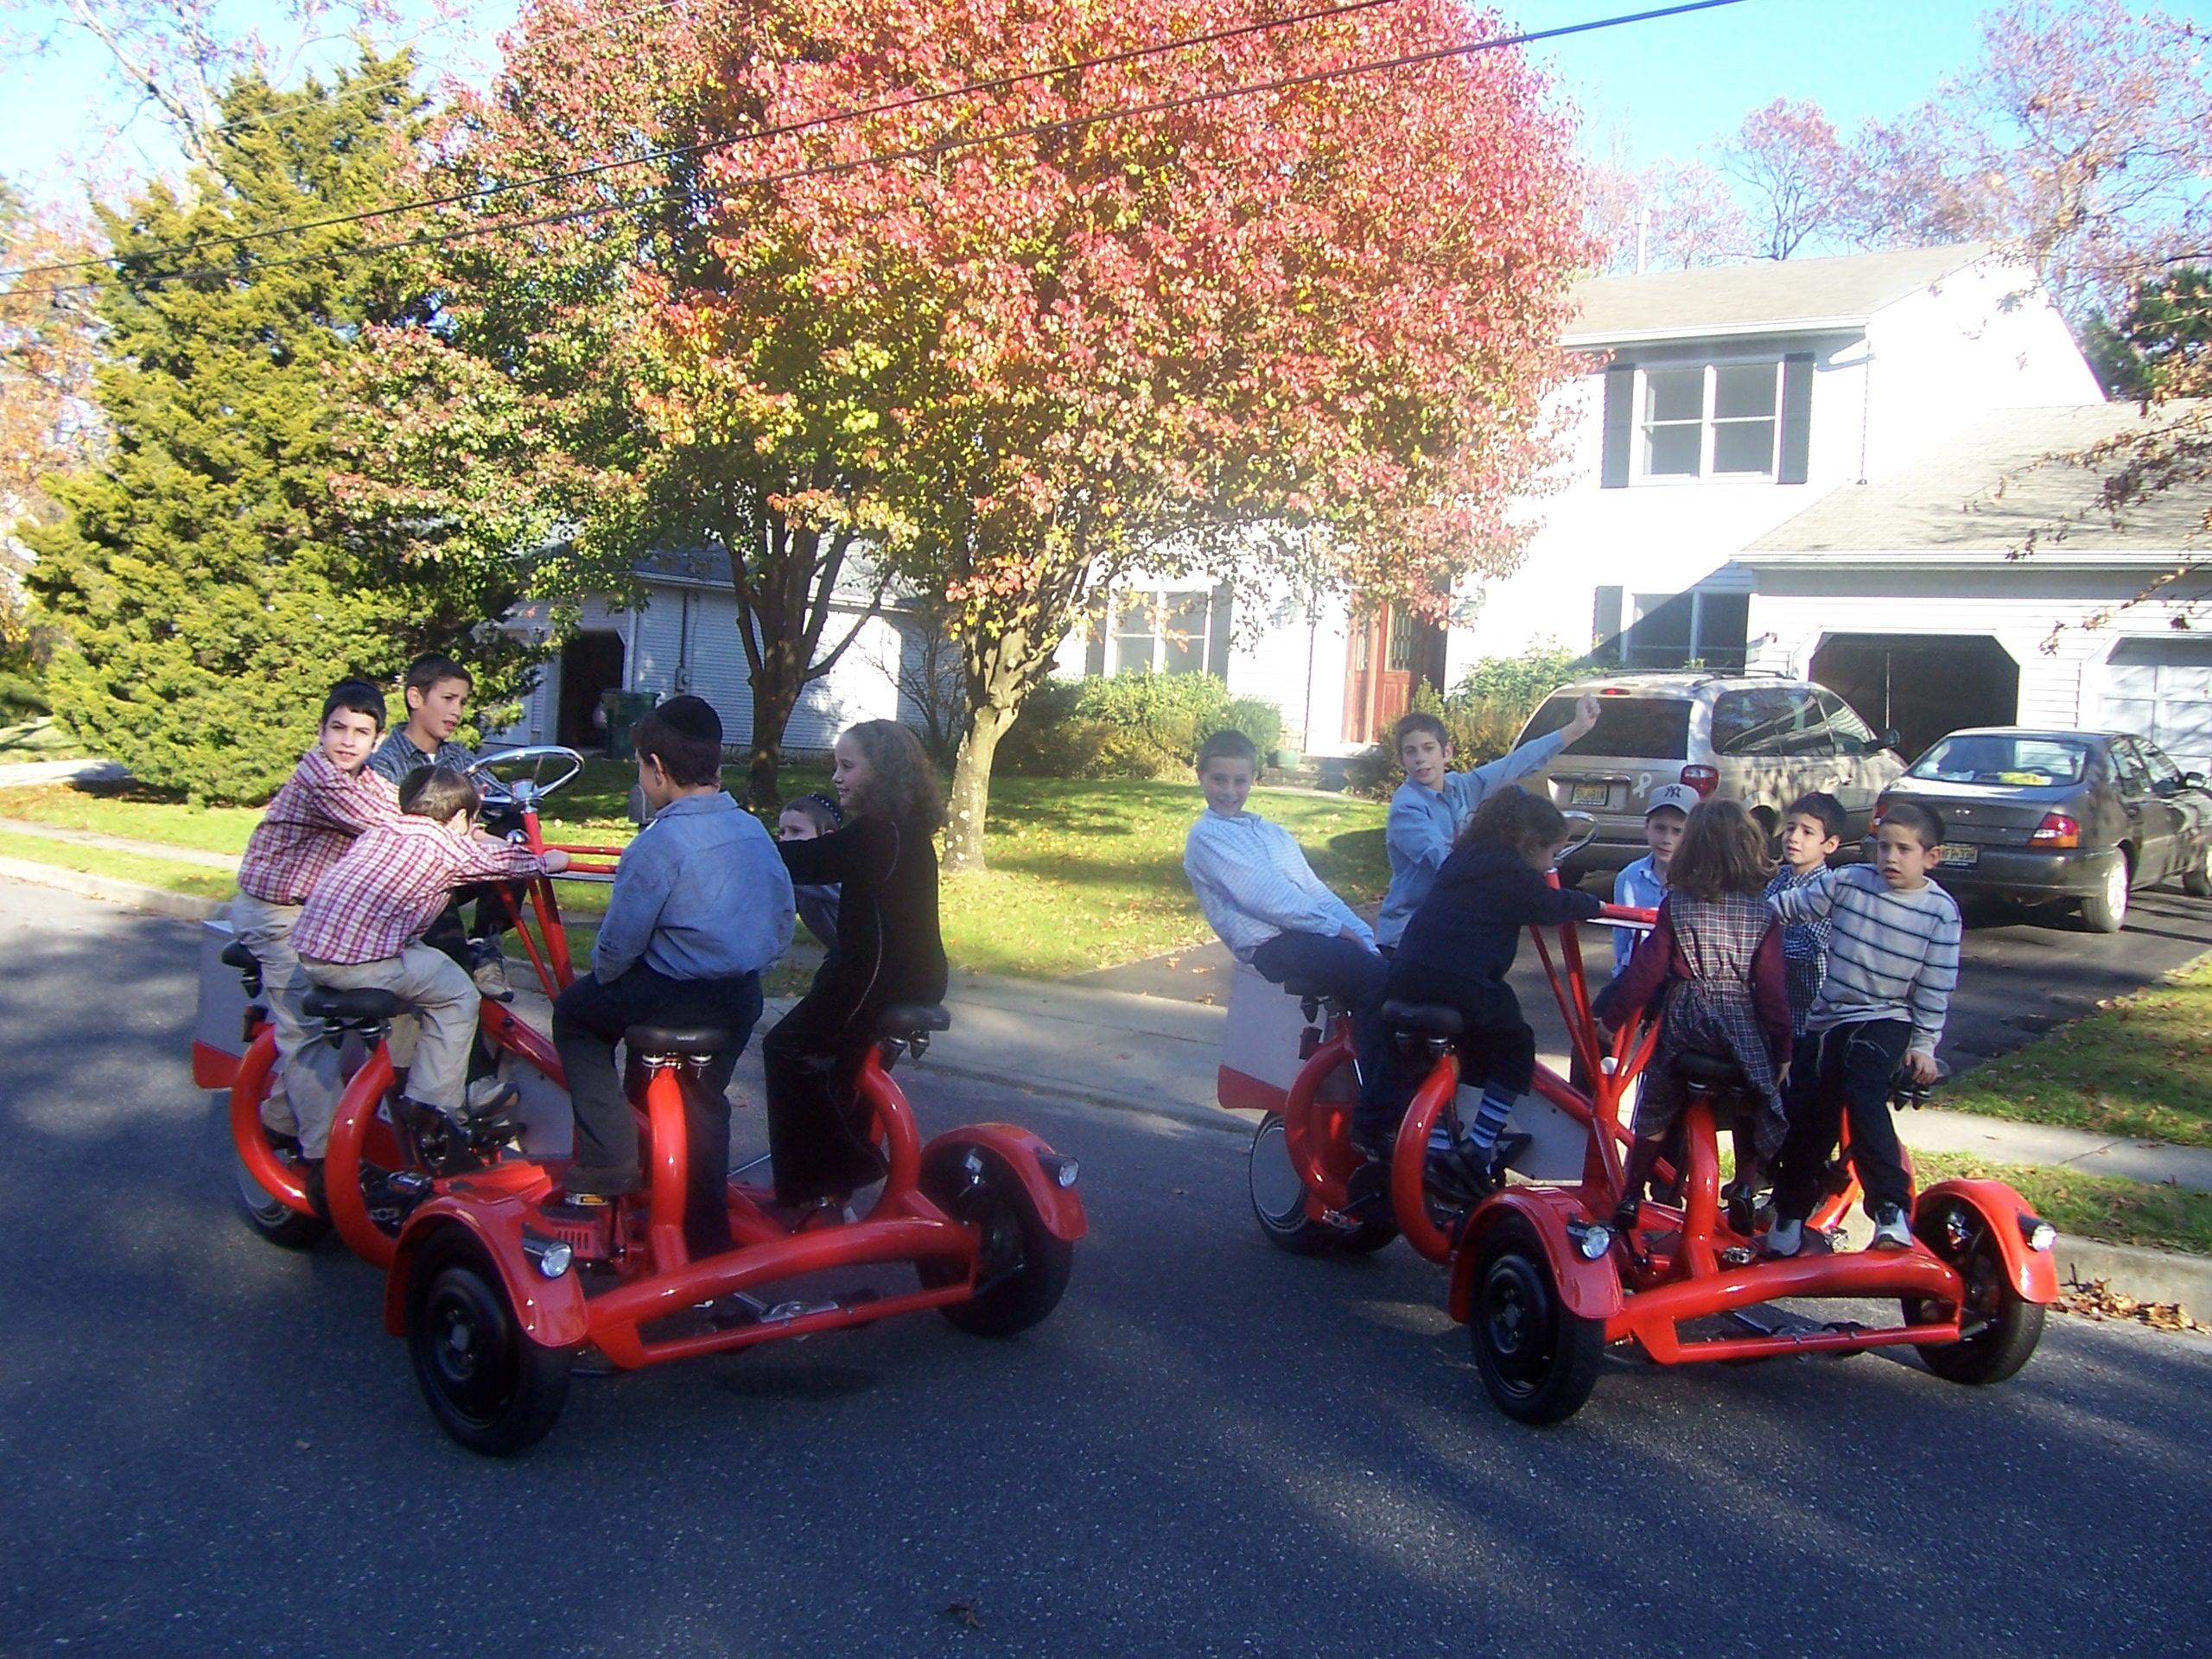 Children Peddling on Conference Bikes